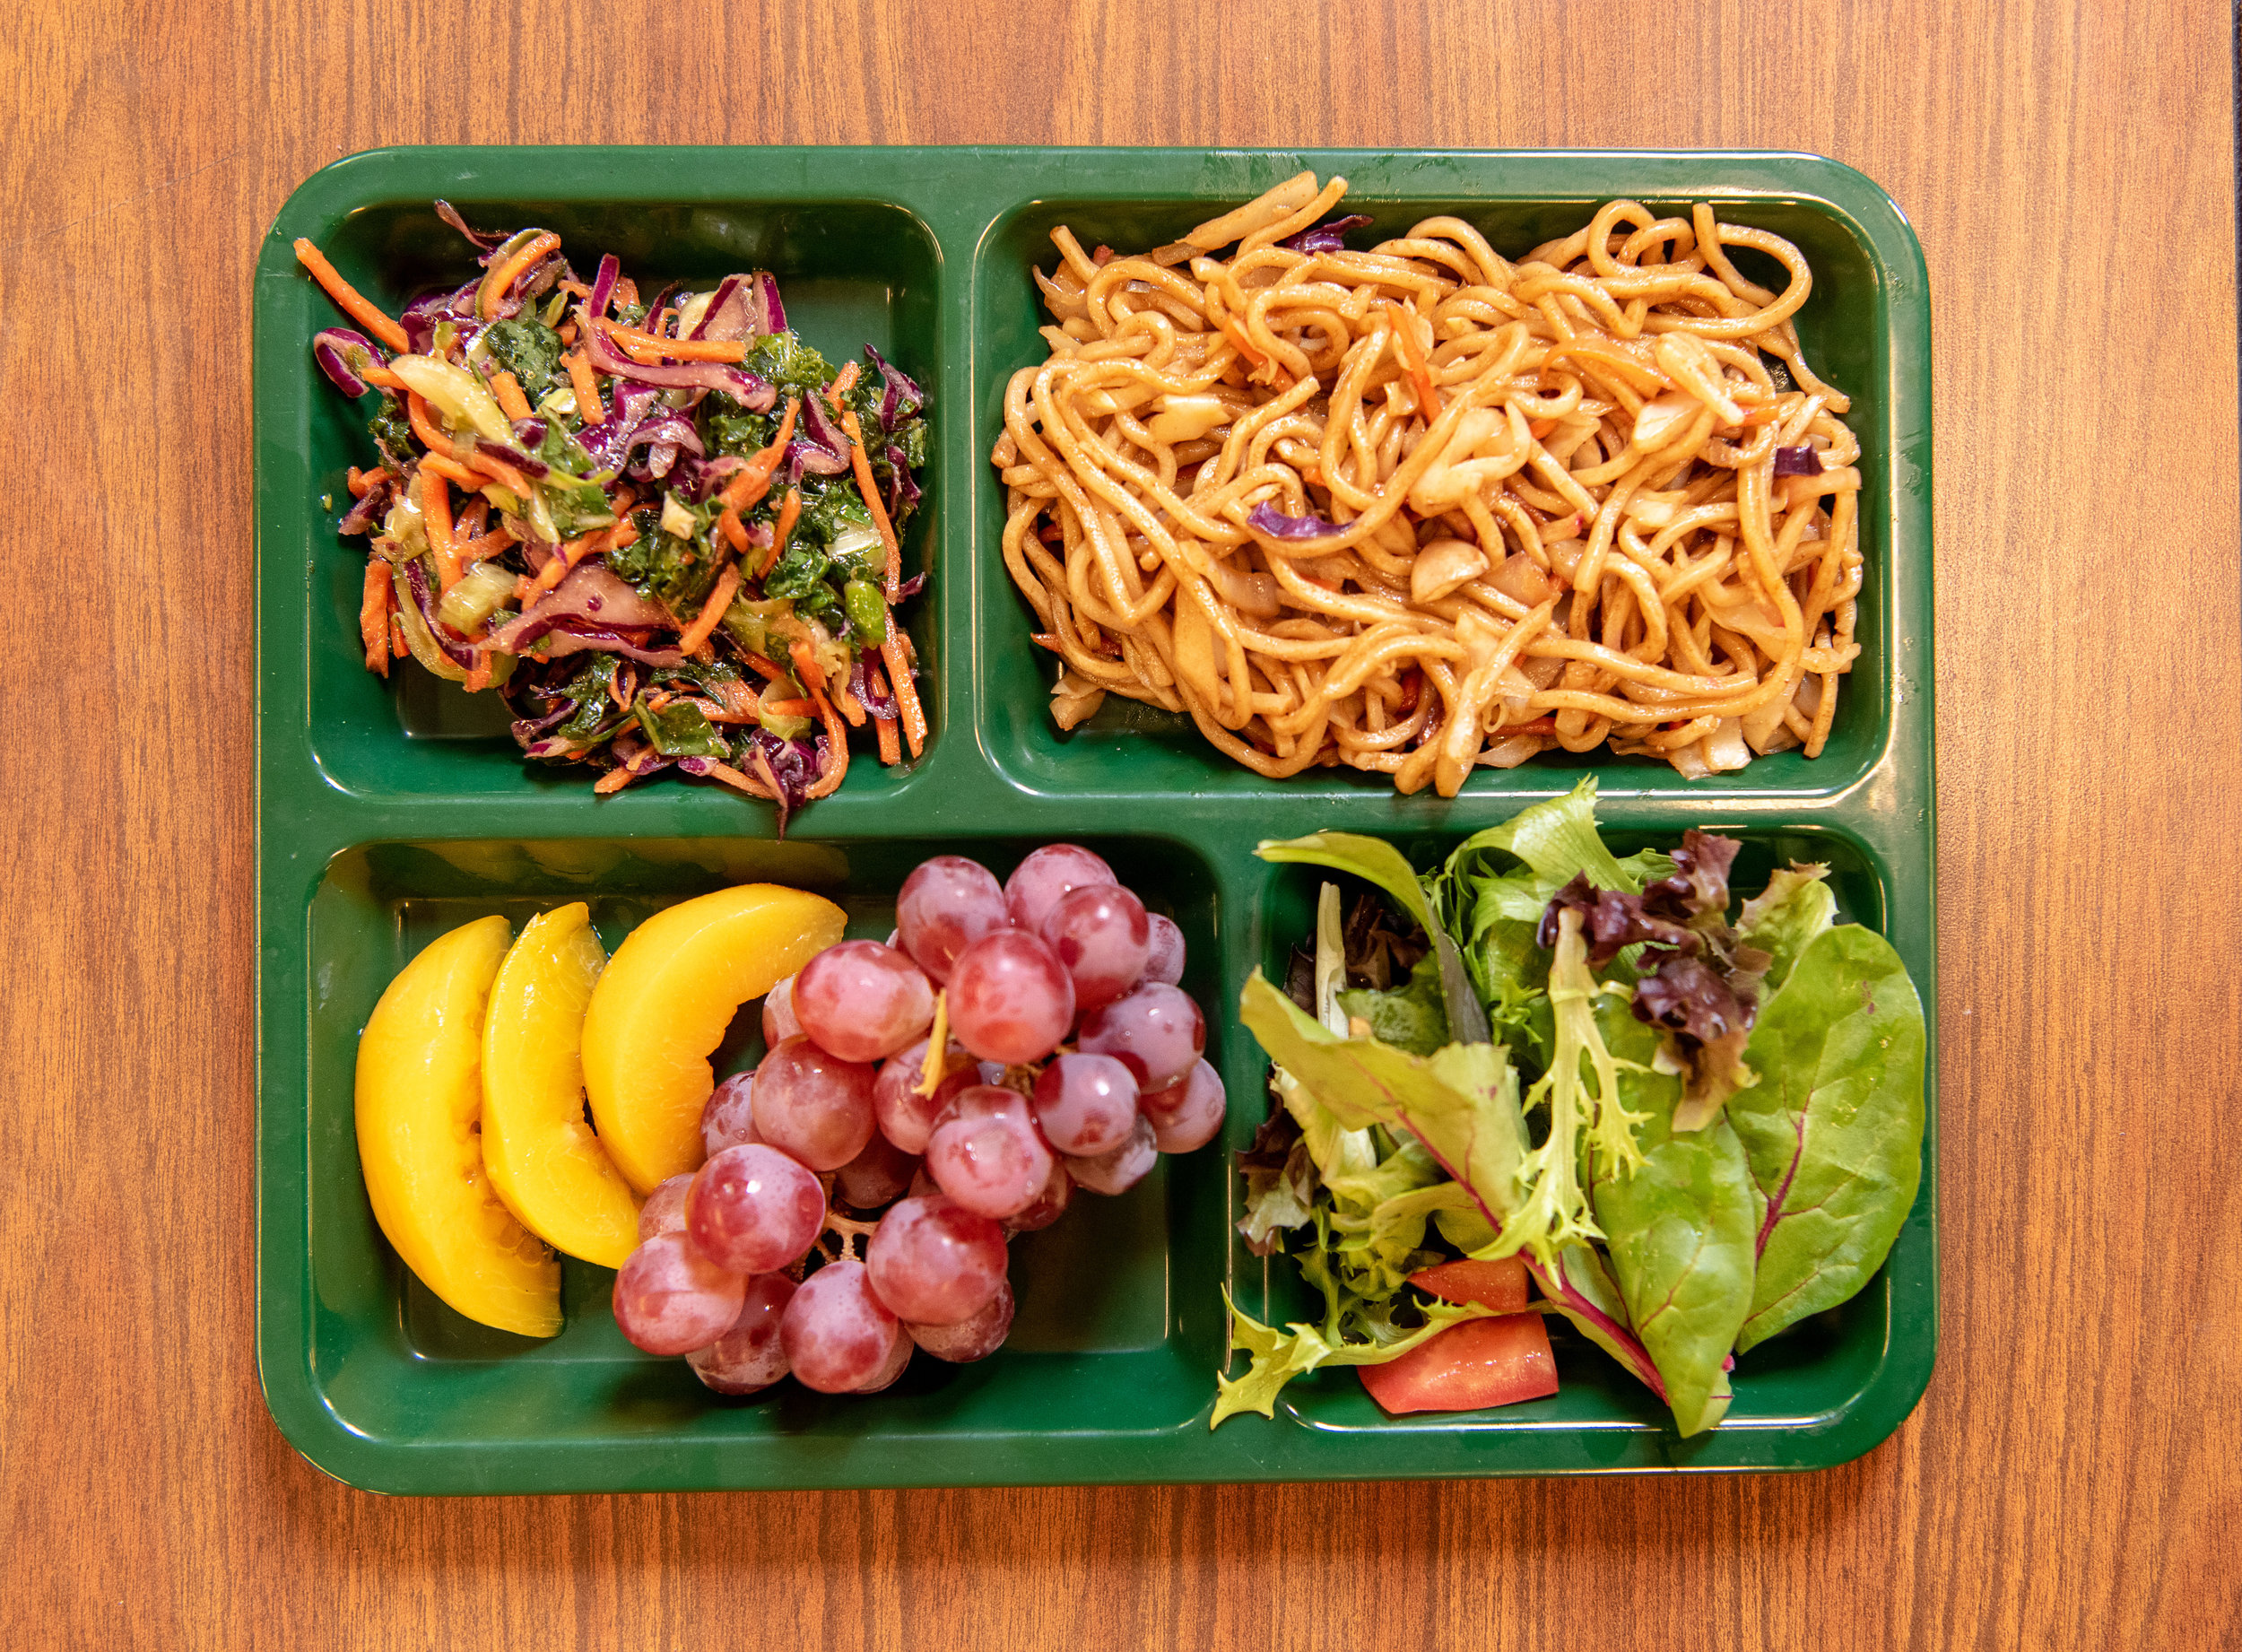 umi_school_lunch_line_0111.jpg